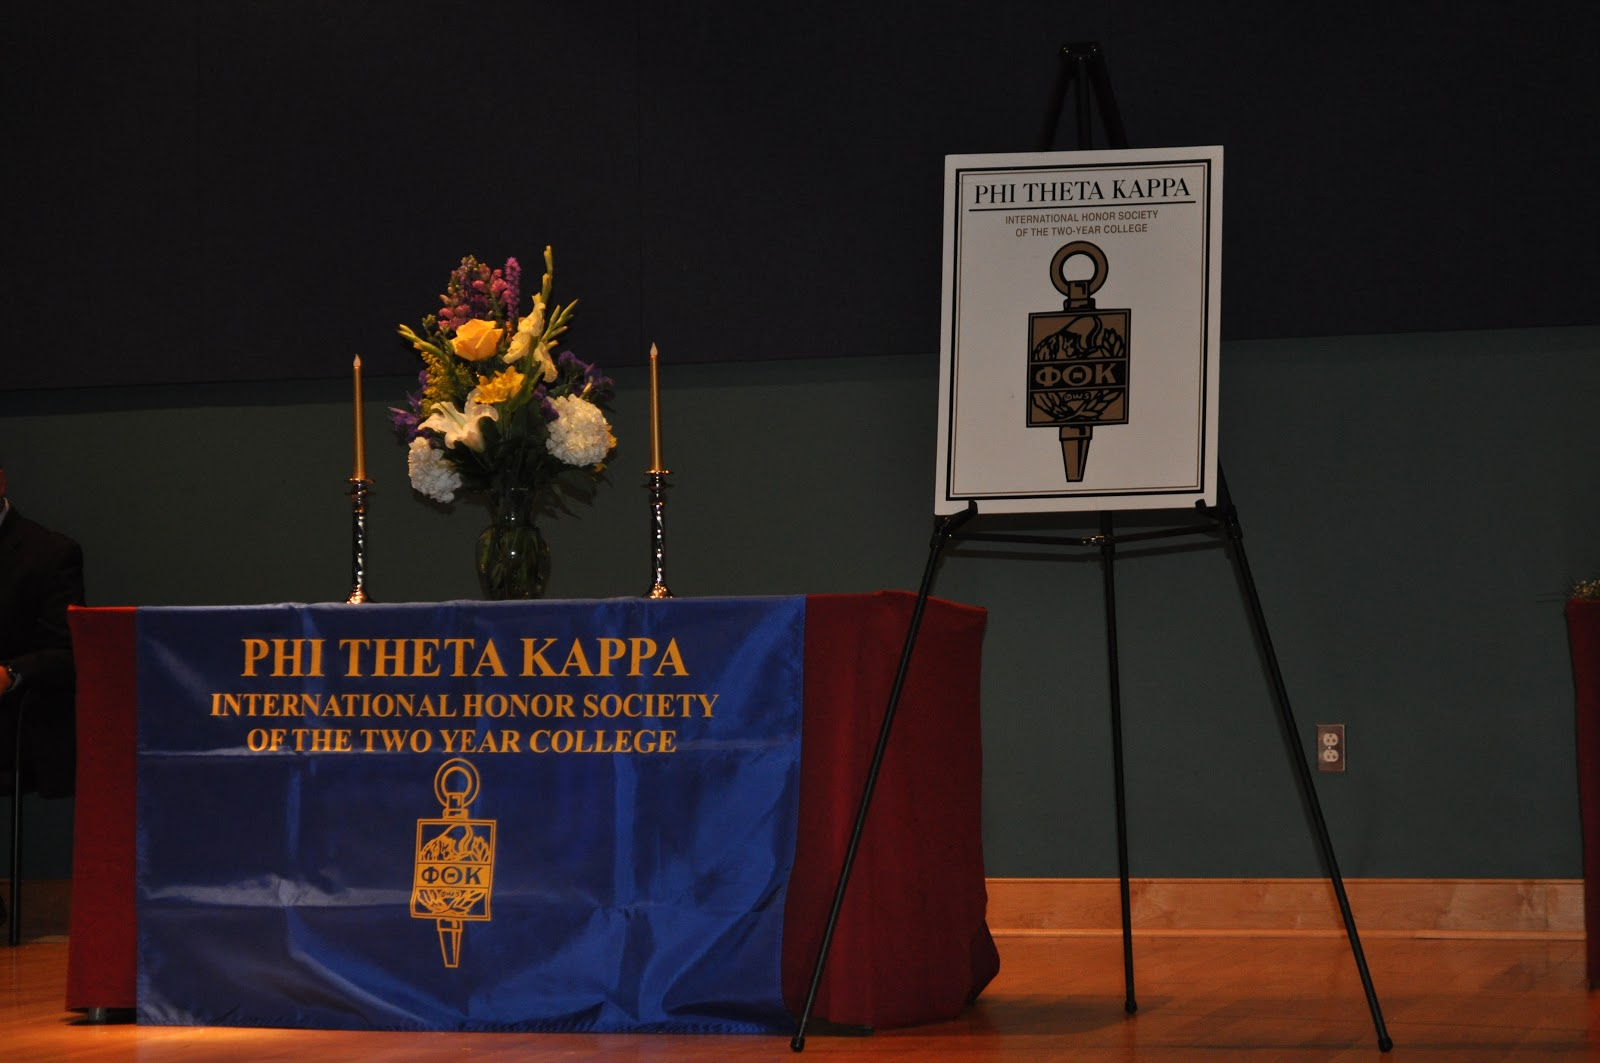 phi theta kappa and kappa honor